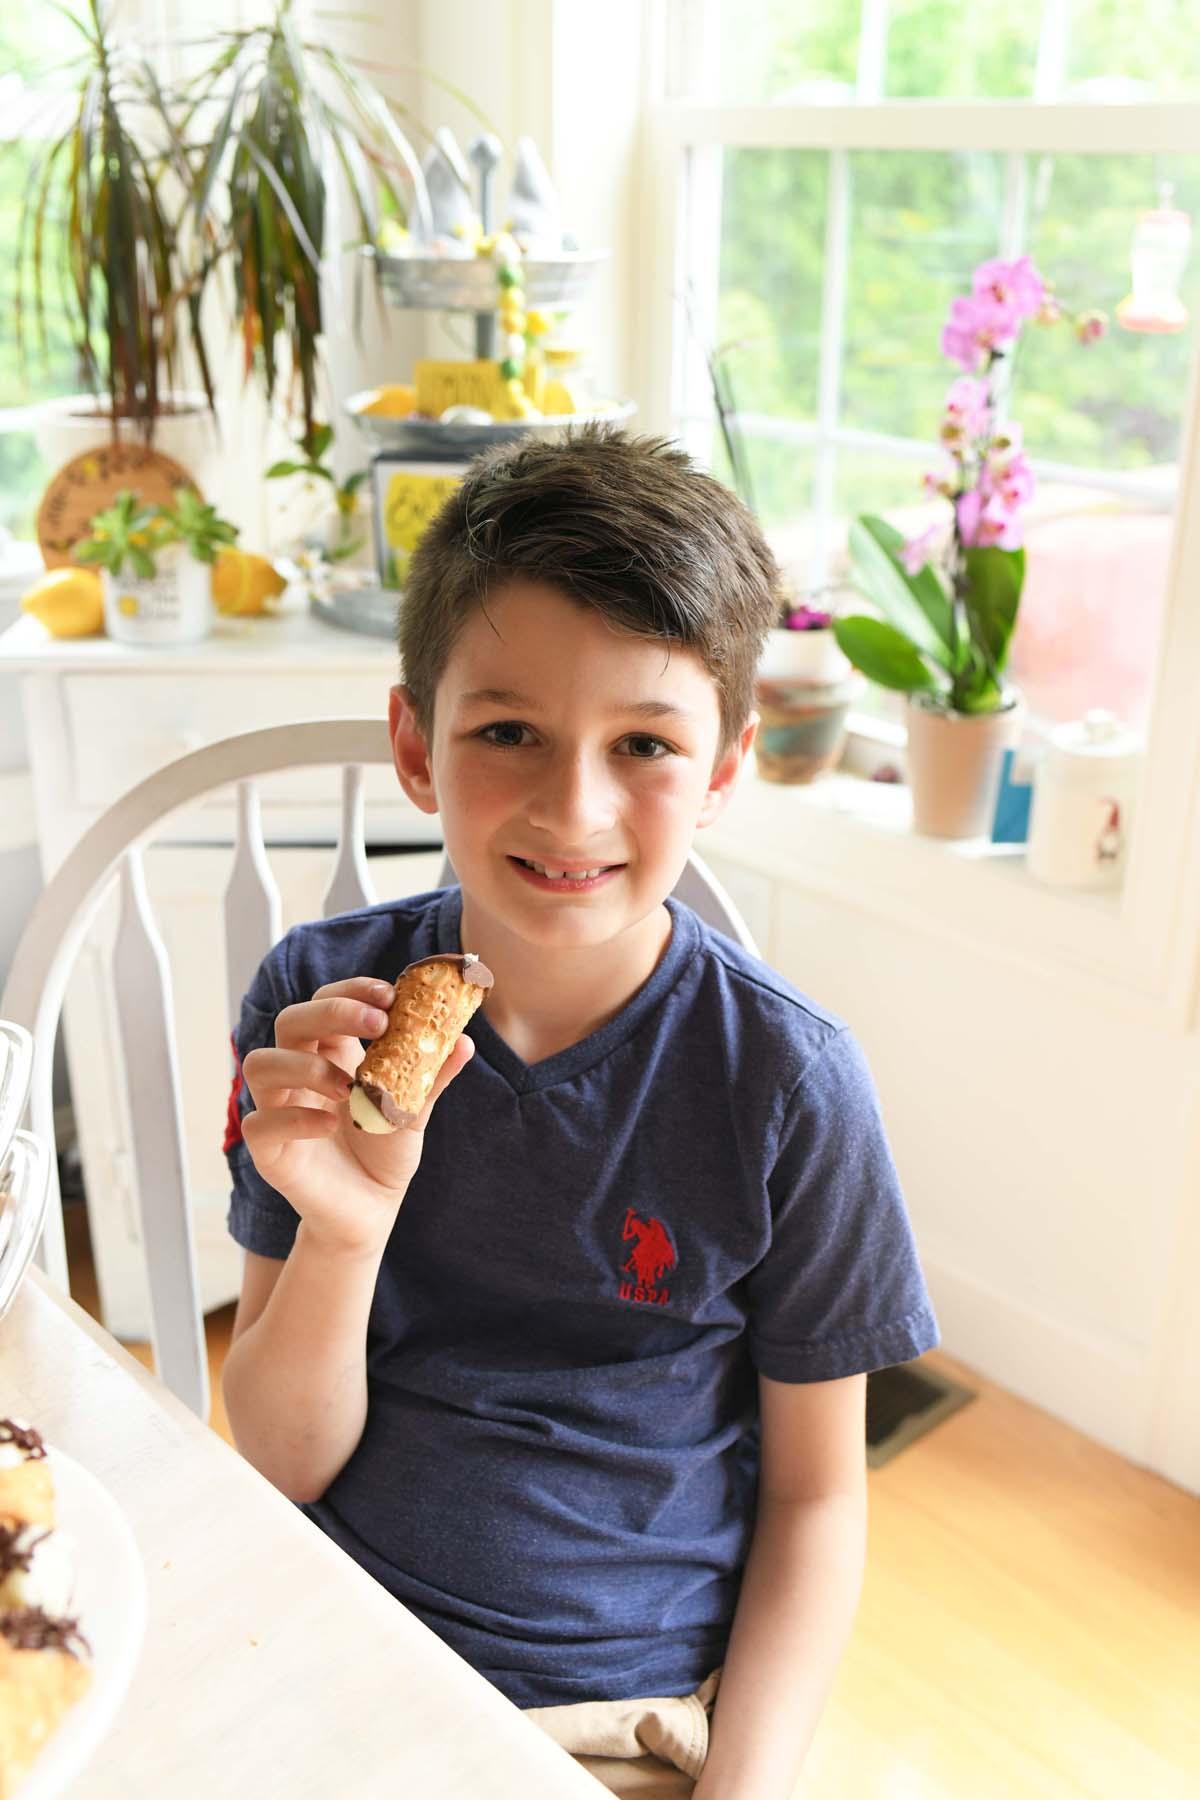 Boy eating a Golden Cannoli.